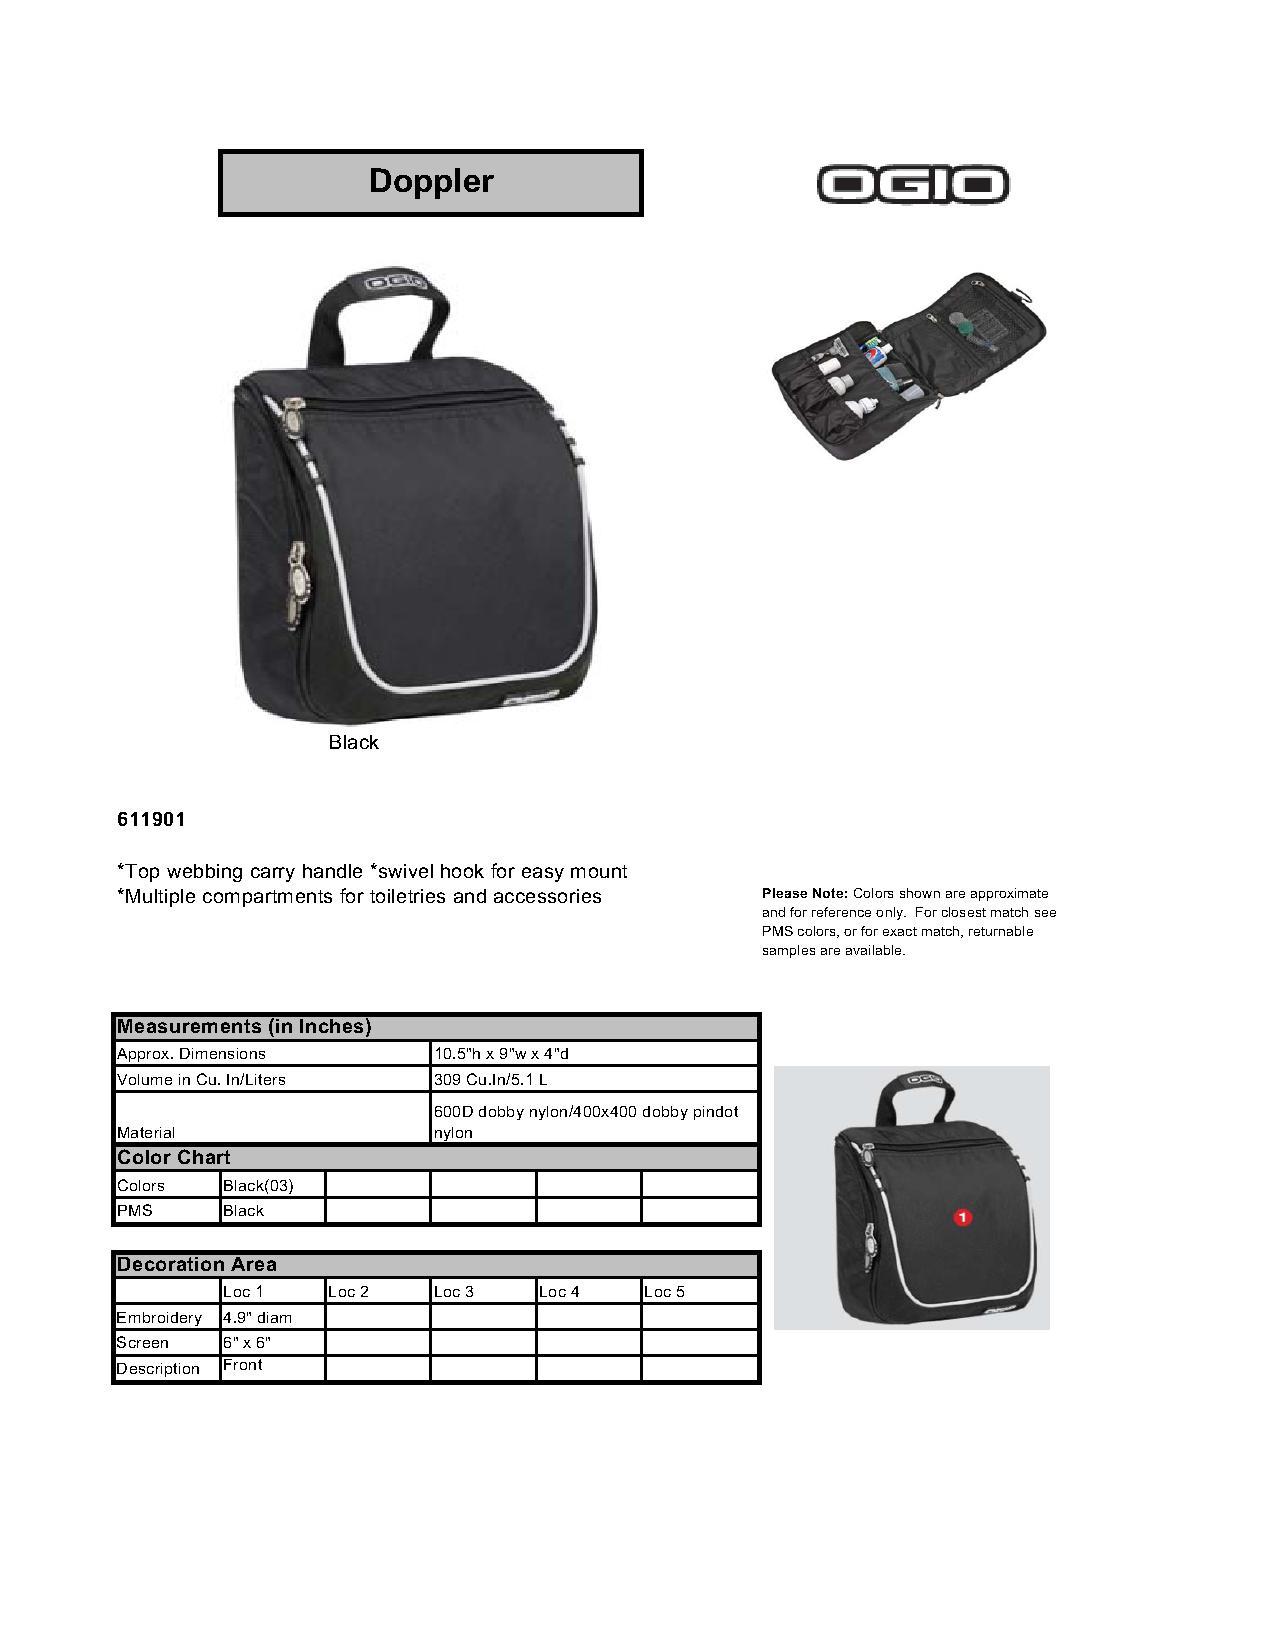 OGIO® 611901 Doppler Kit - Accessories 822425f7d5